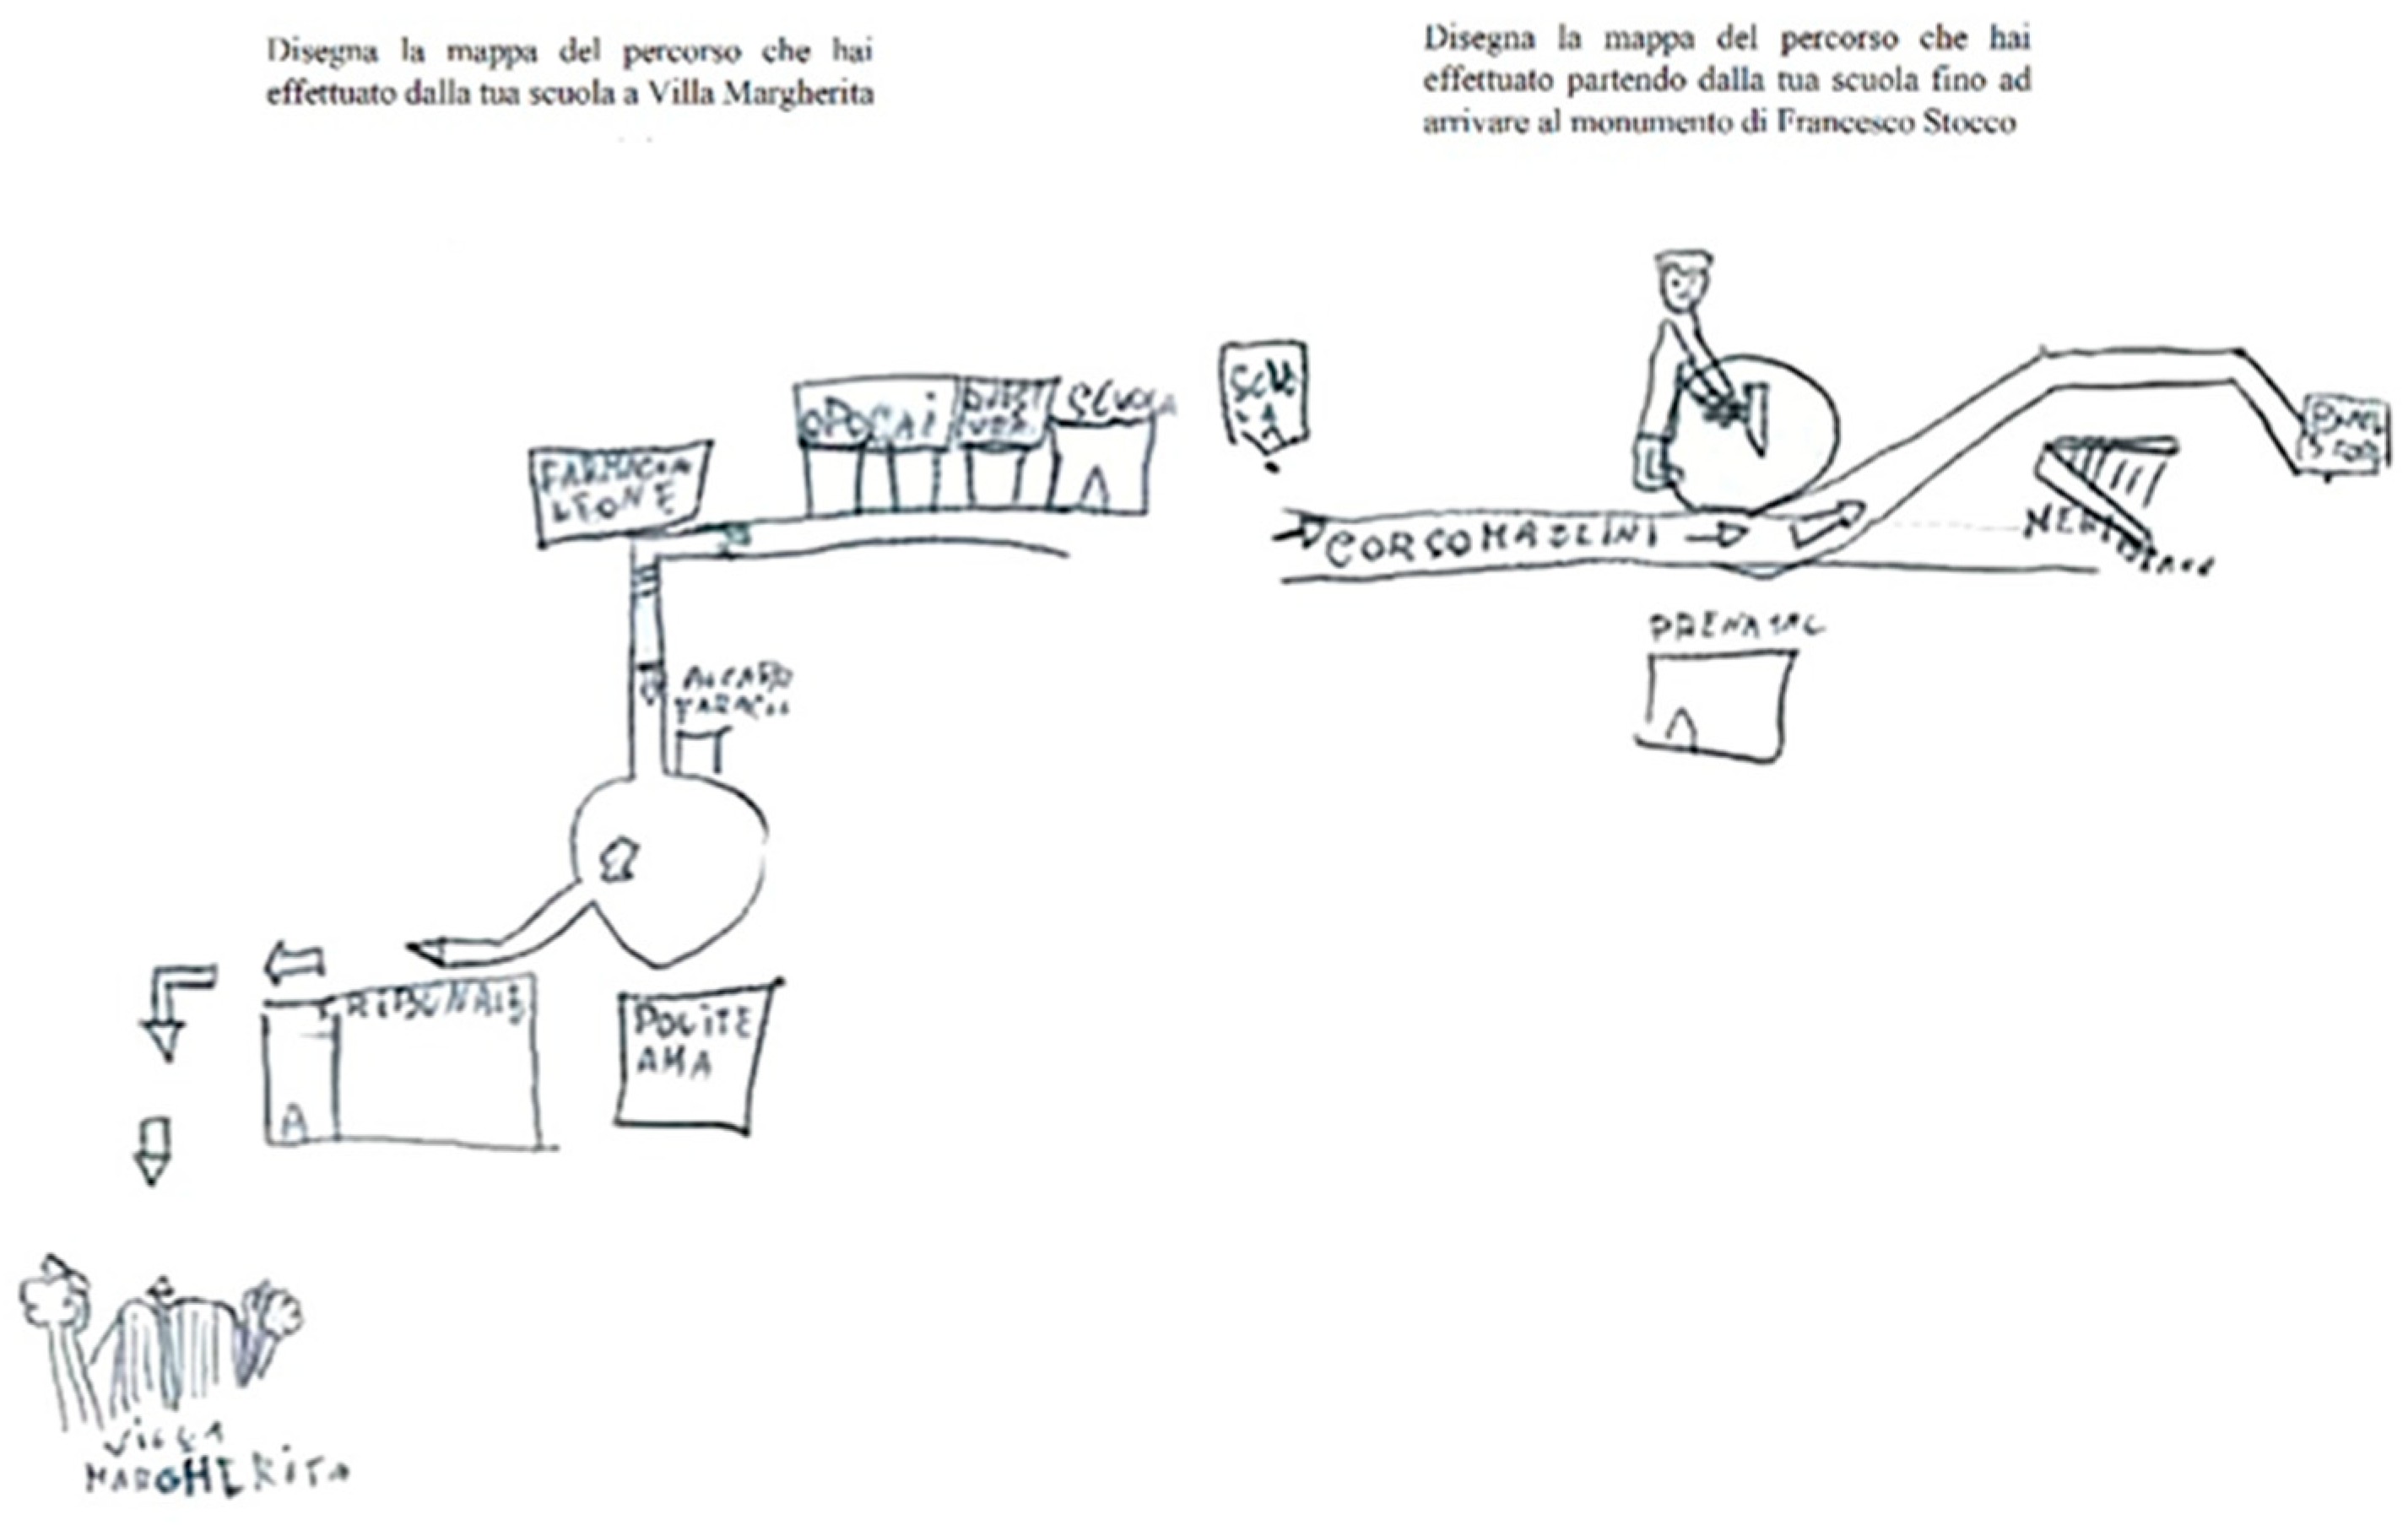 Casa Della Carta Padova sustainability | free full-text | a study on memory sites